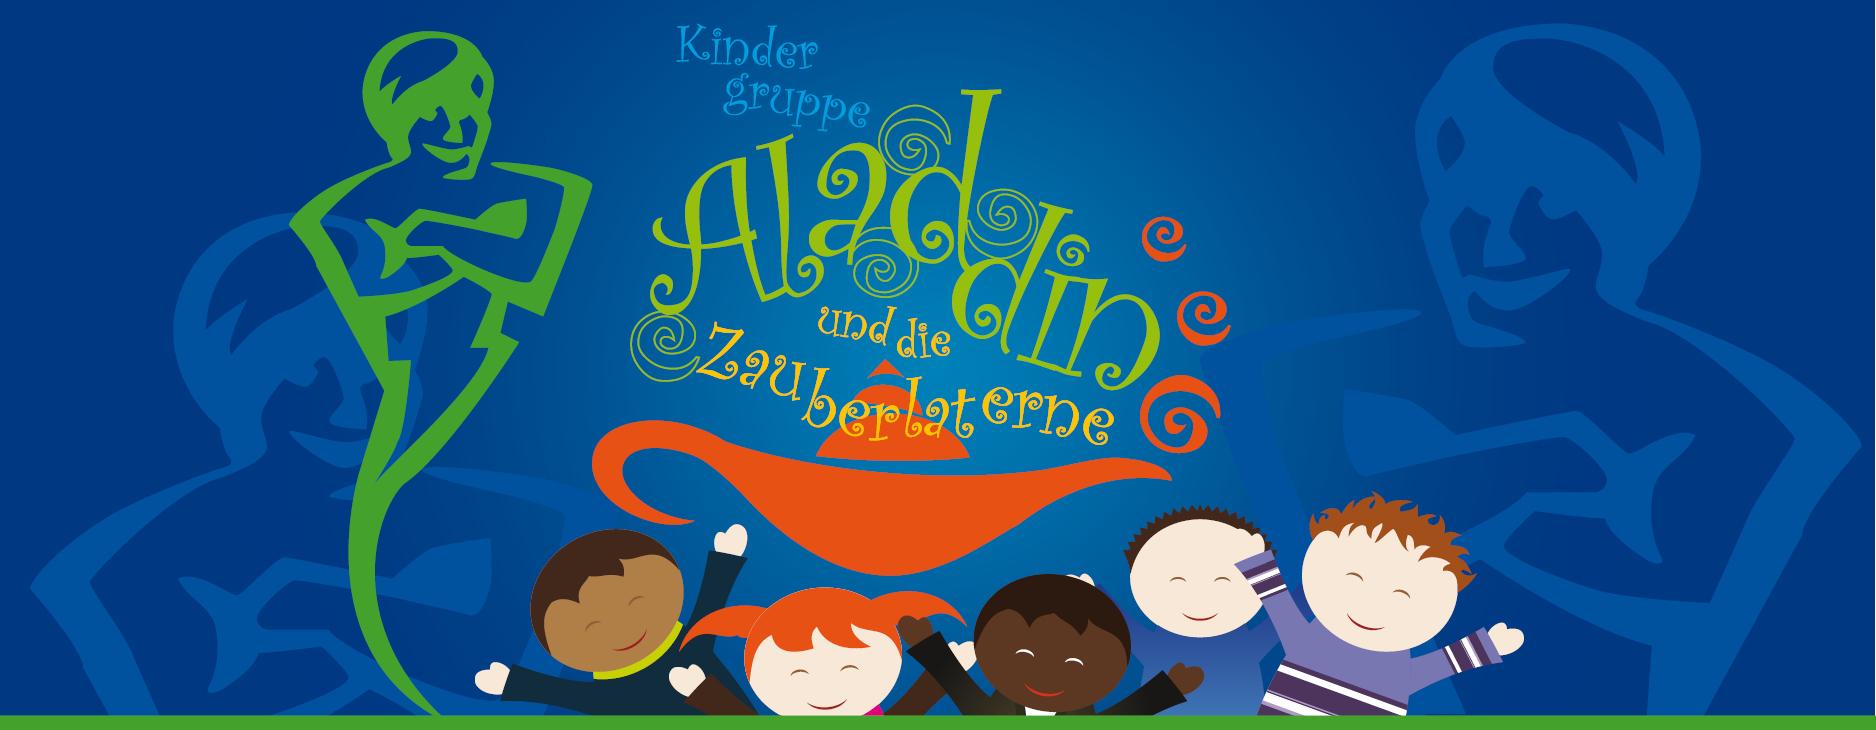 Kindergruppe Aladin - Logo